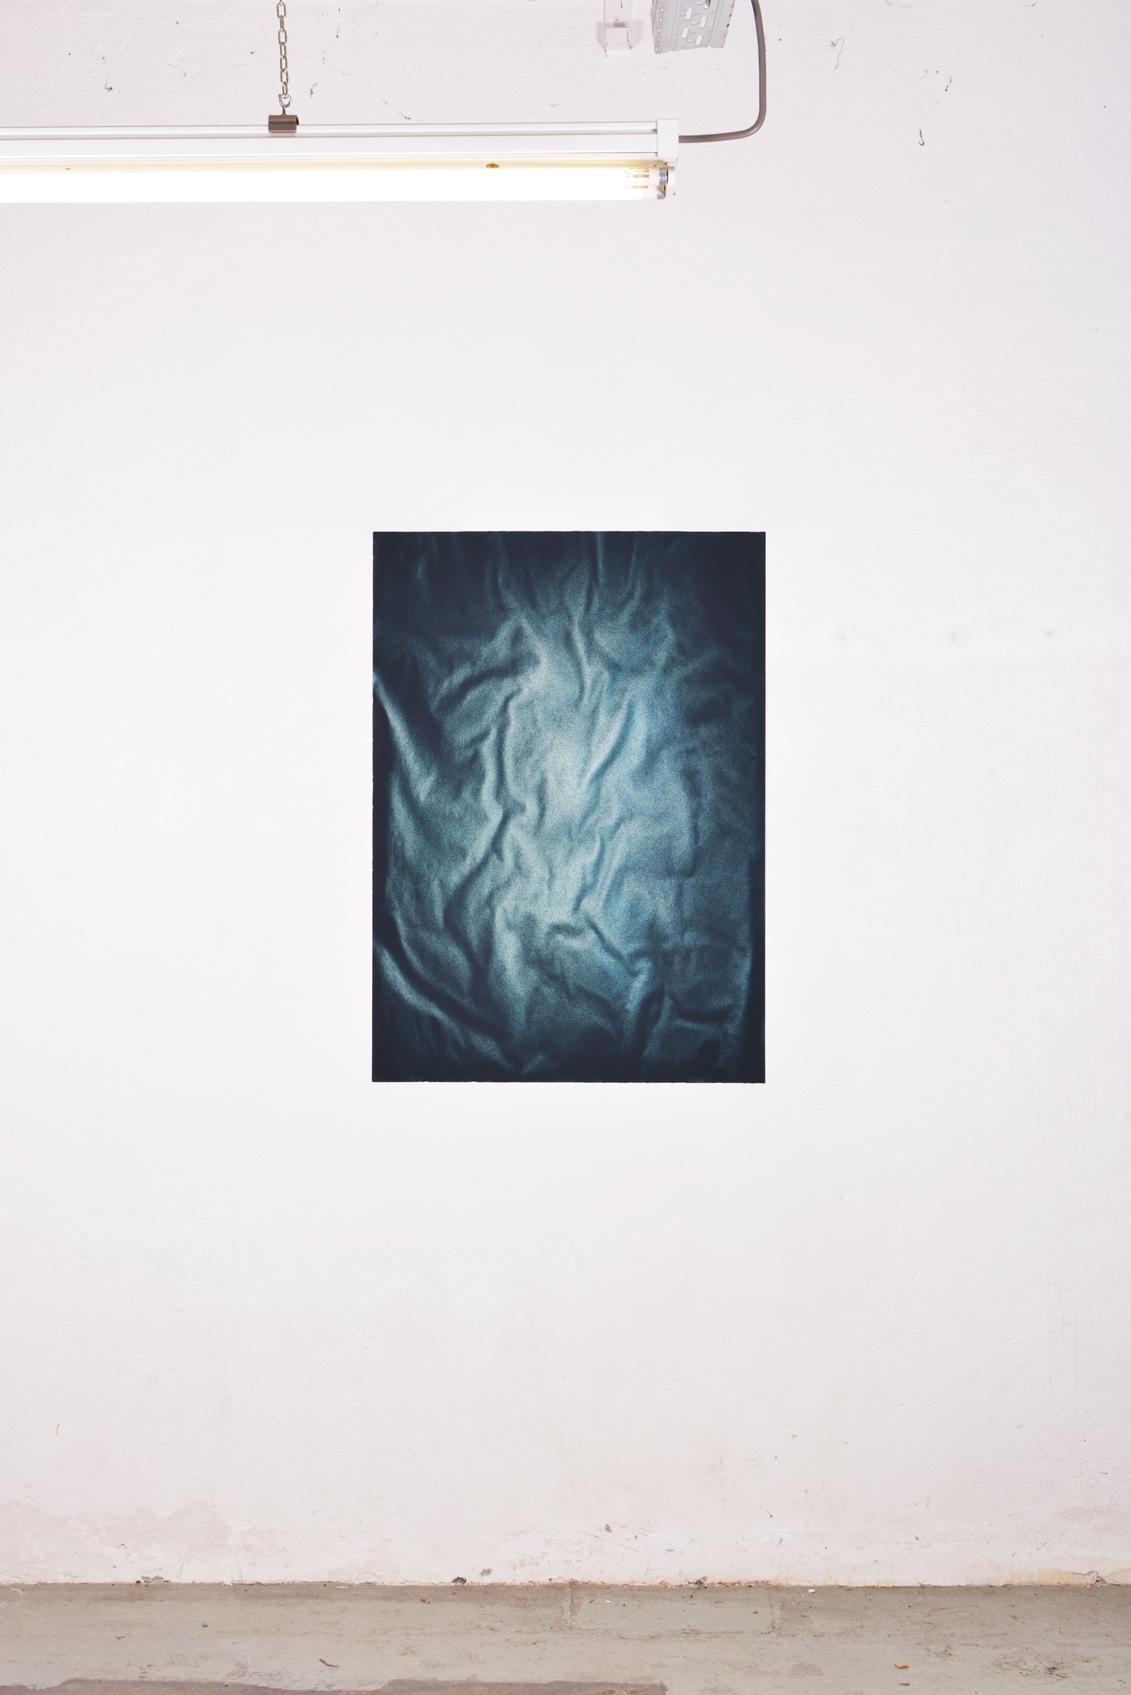 Ninfa Fluida_Double V Gallery_Marseille_19PG BV 1 70x100cm (4).jpg